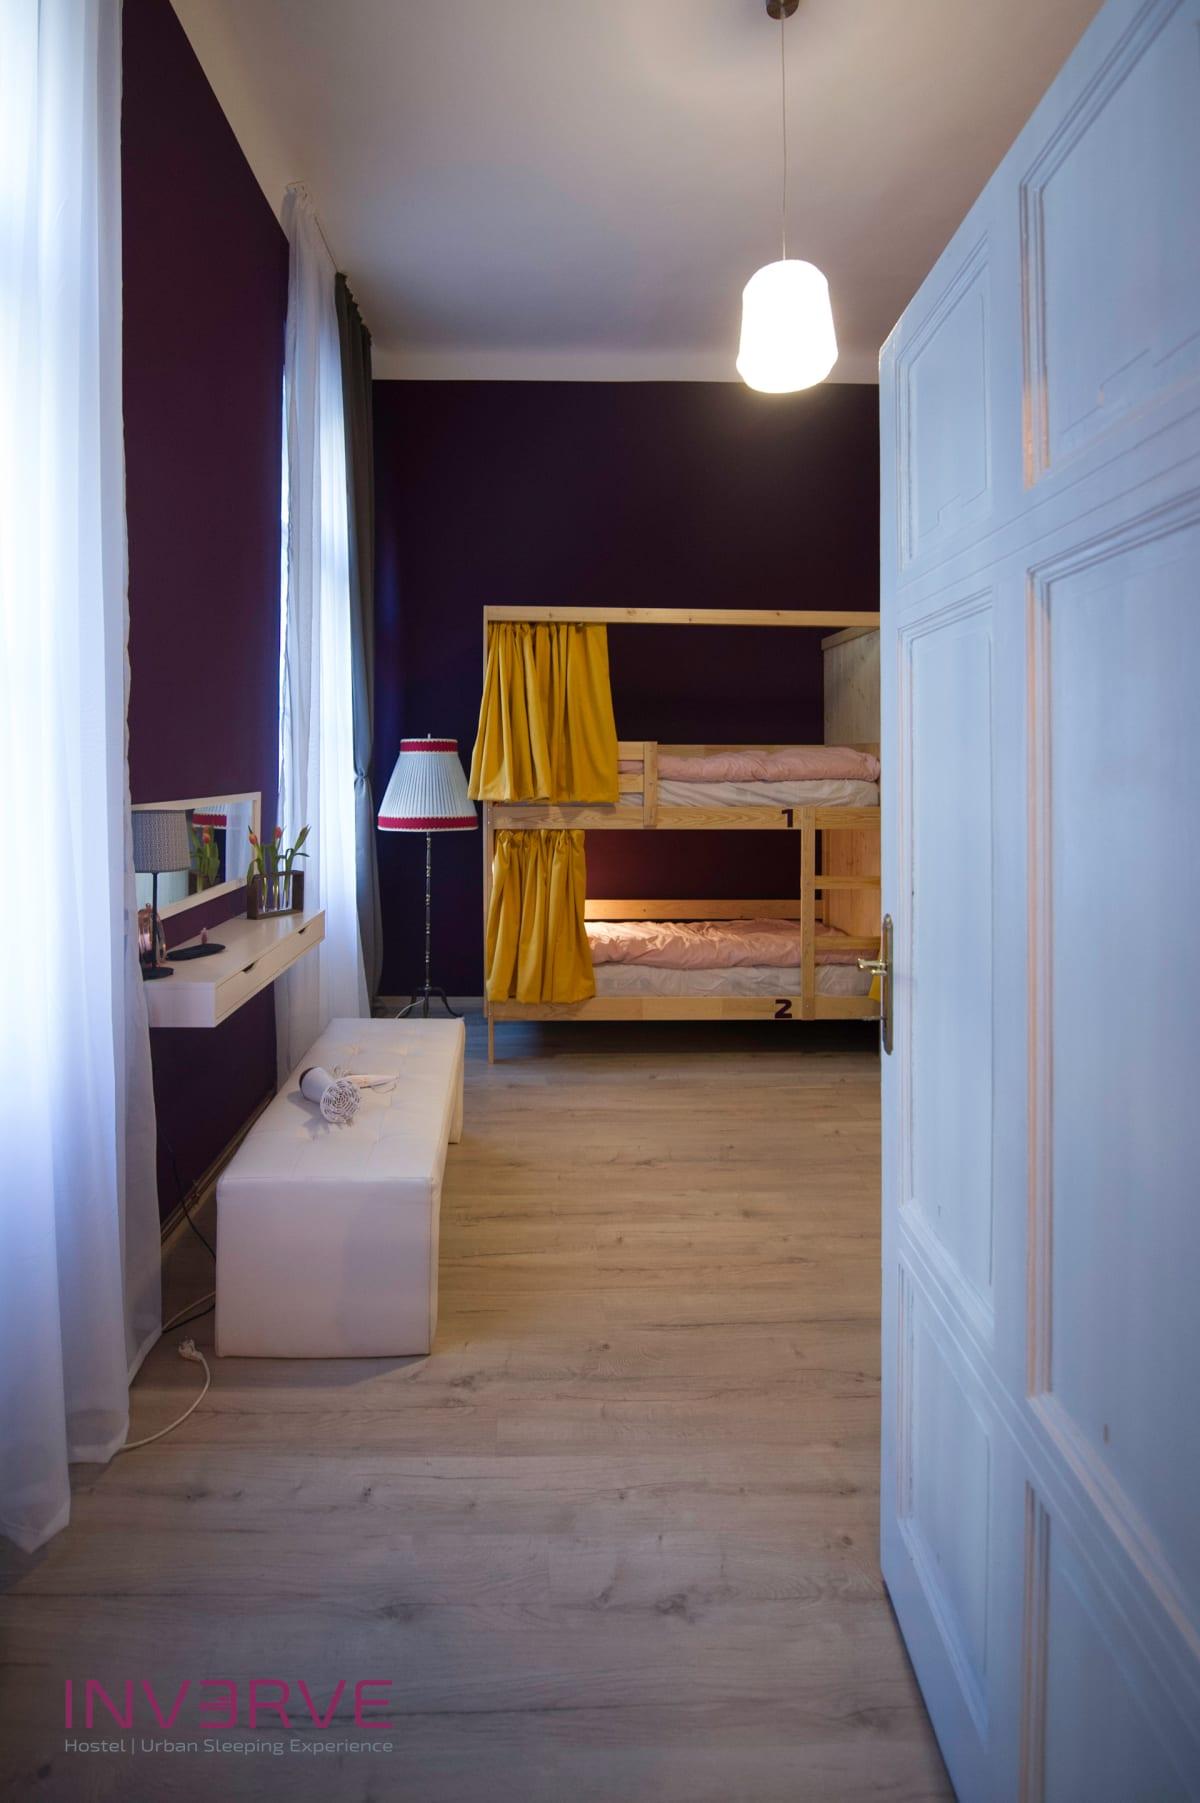 InVerve Hostel, Timisoara, Romania